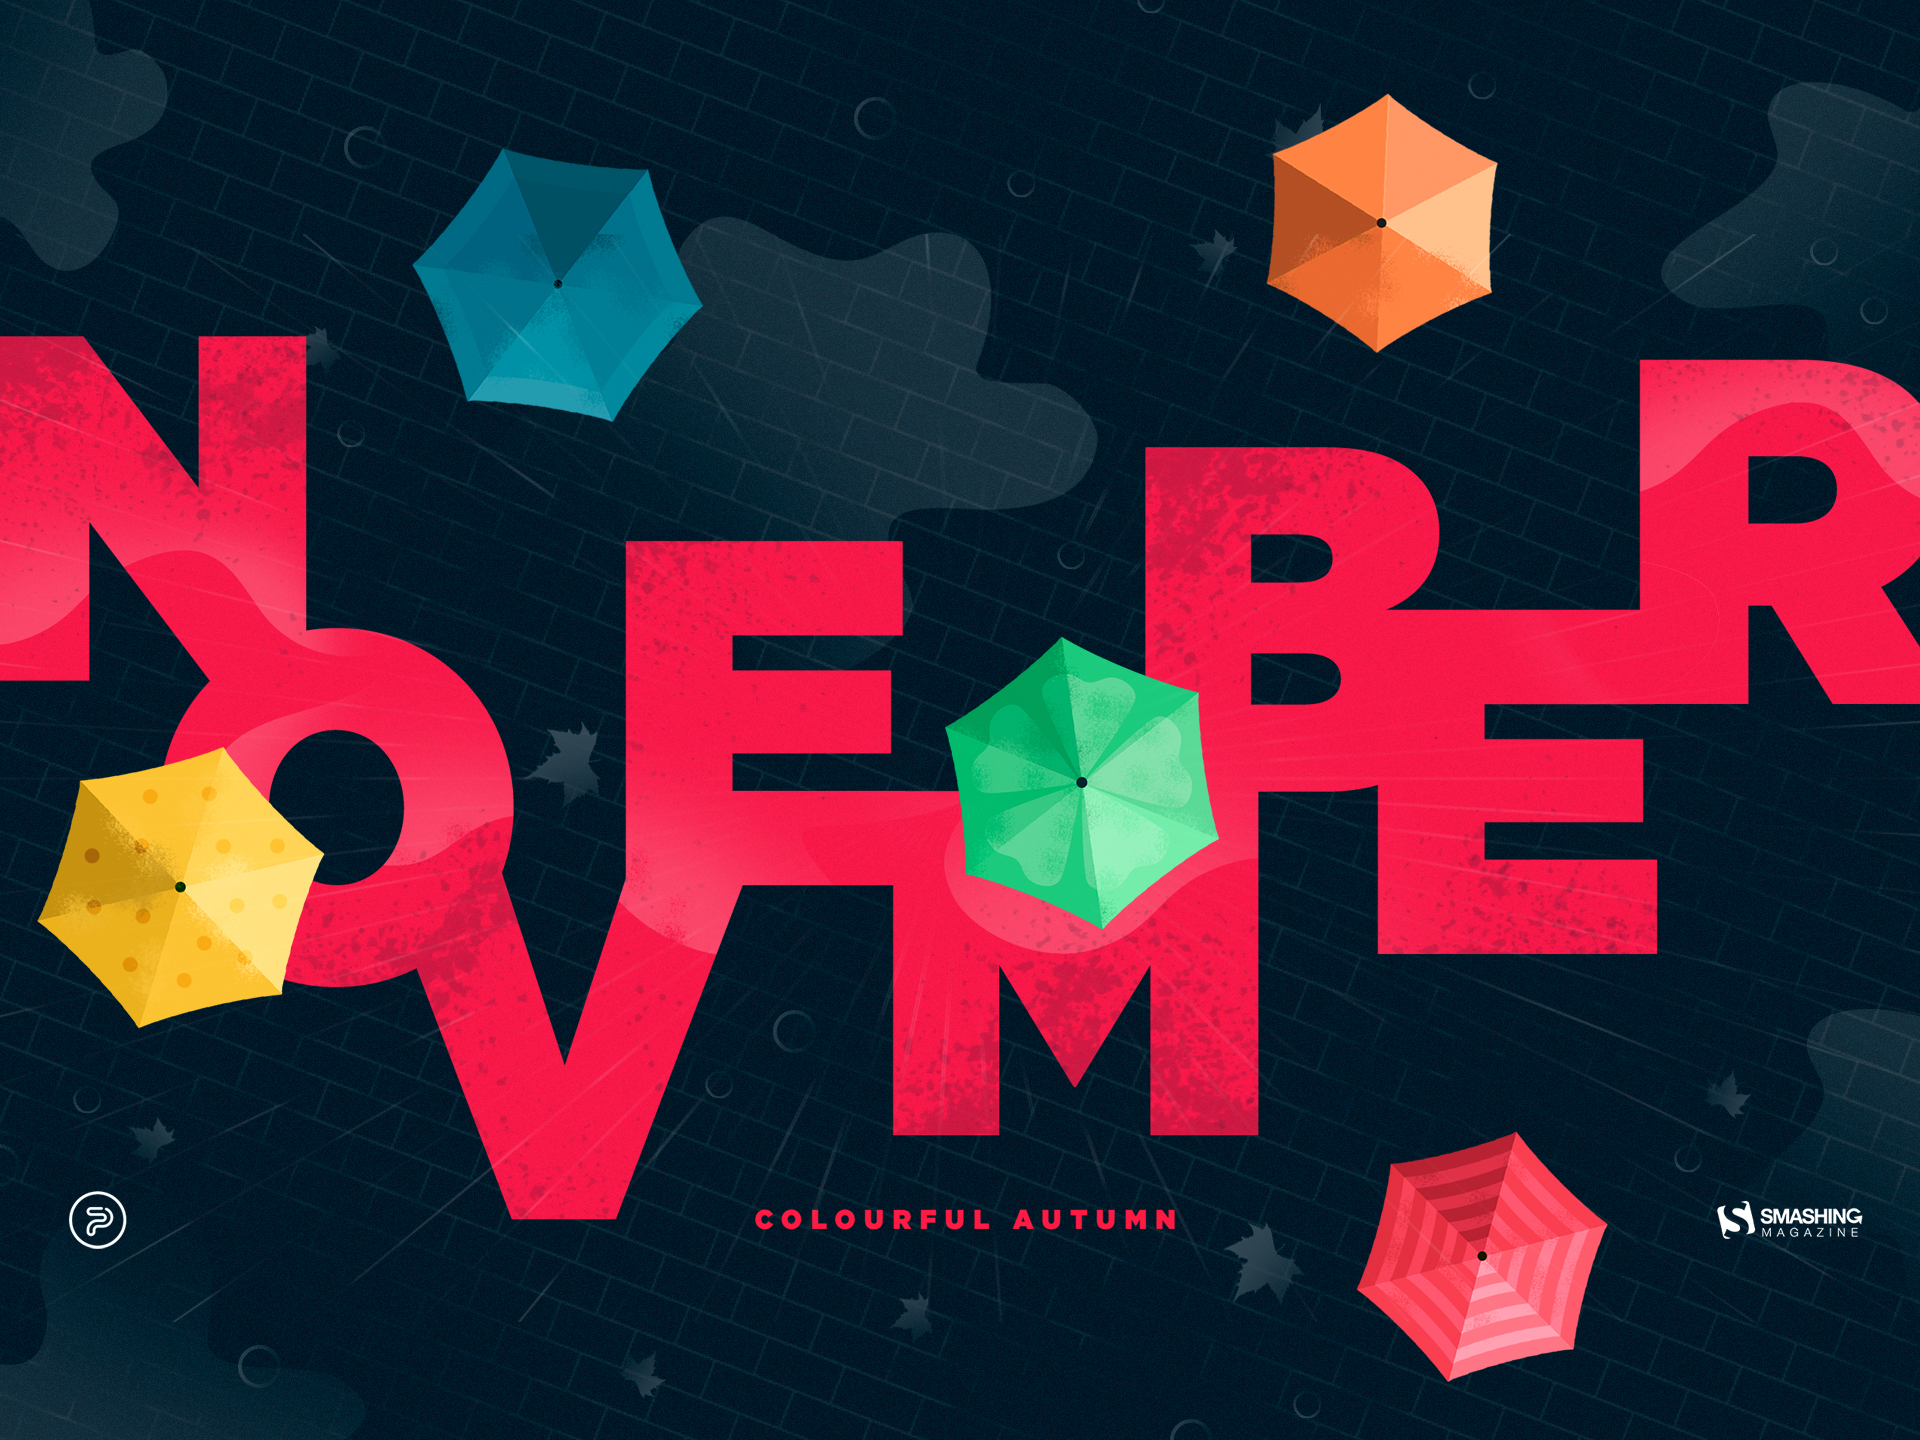 Inspiring Desktop Wallpapers To Make November Even More